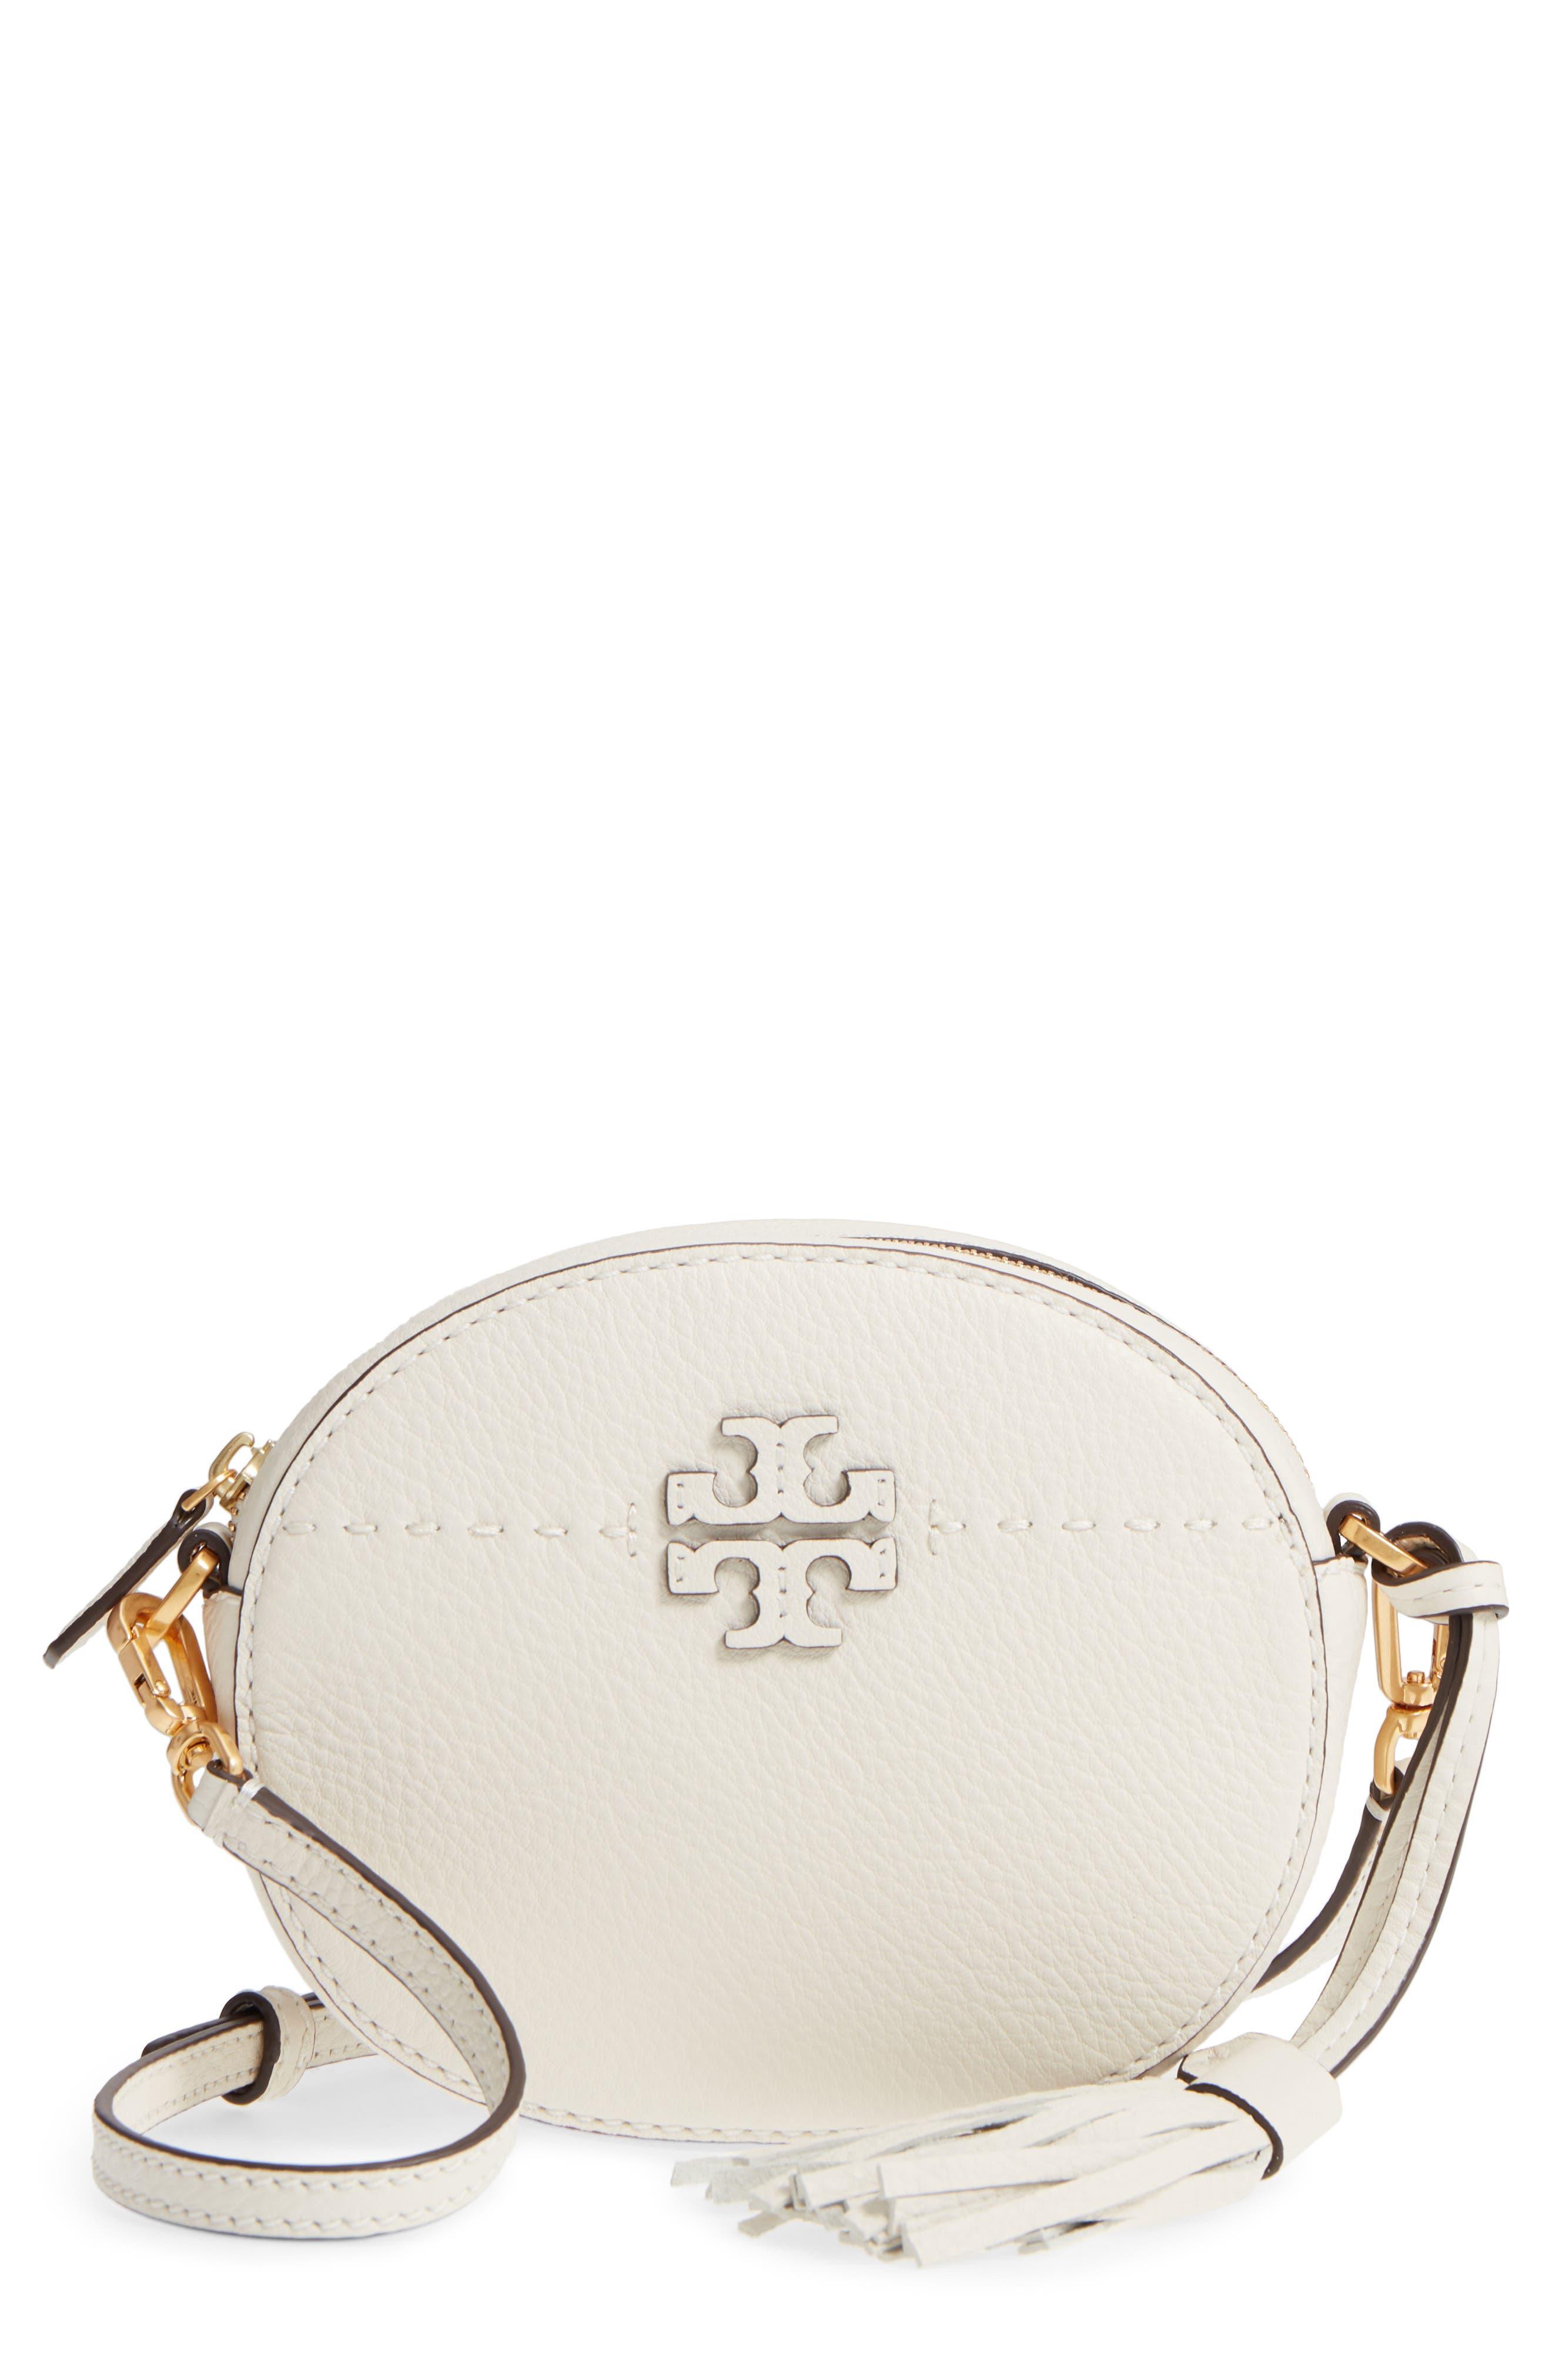 Tory Burch McGraw Leather Crossbody Bag